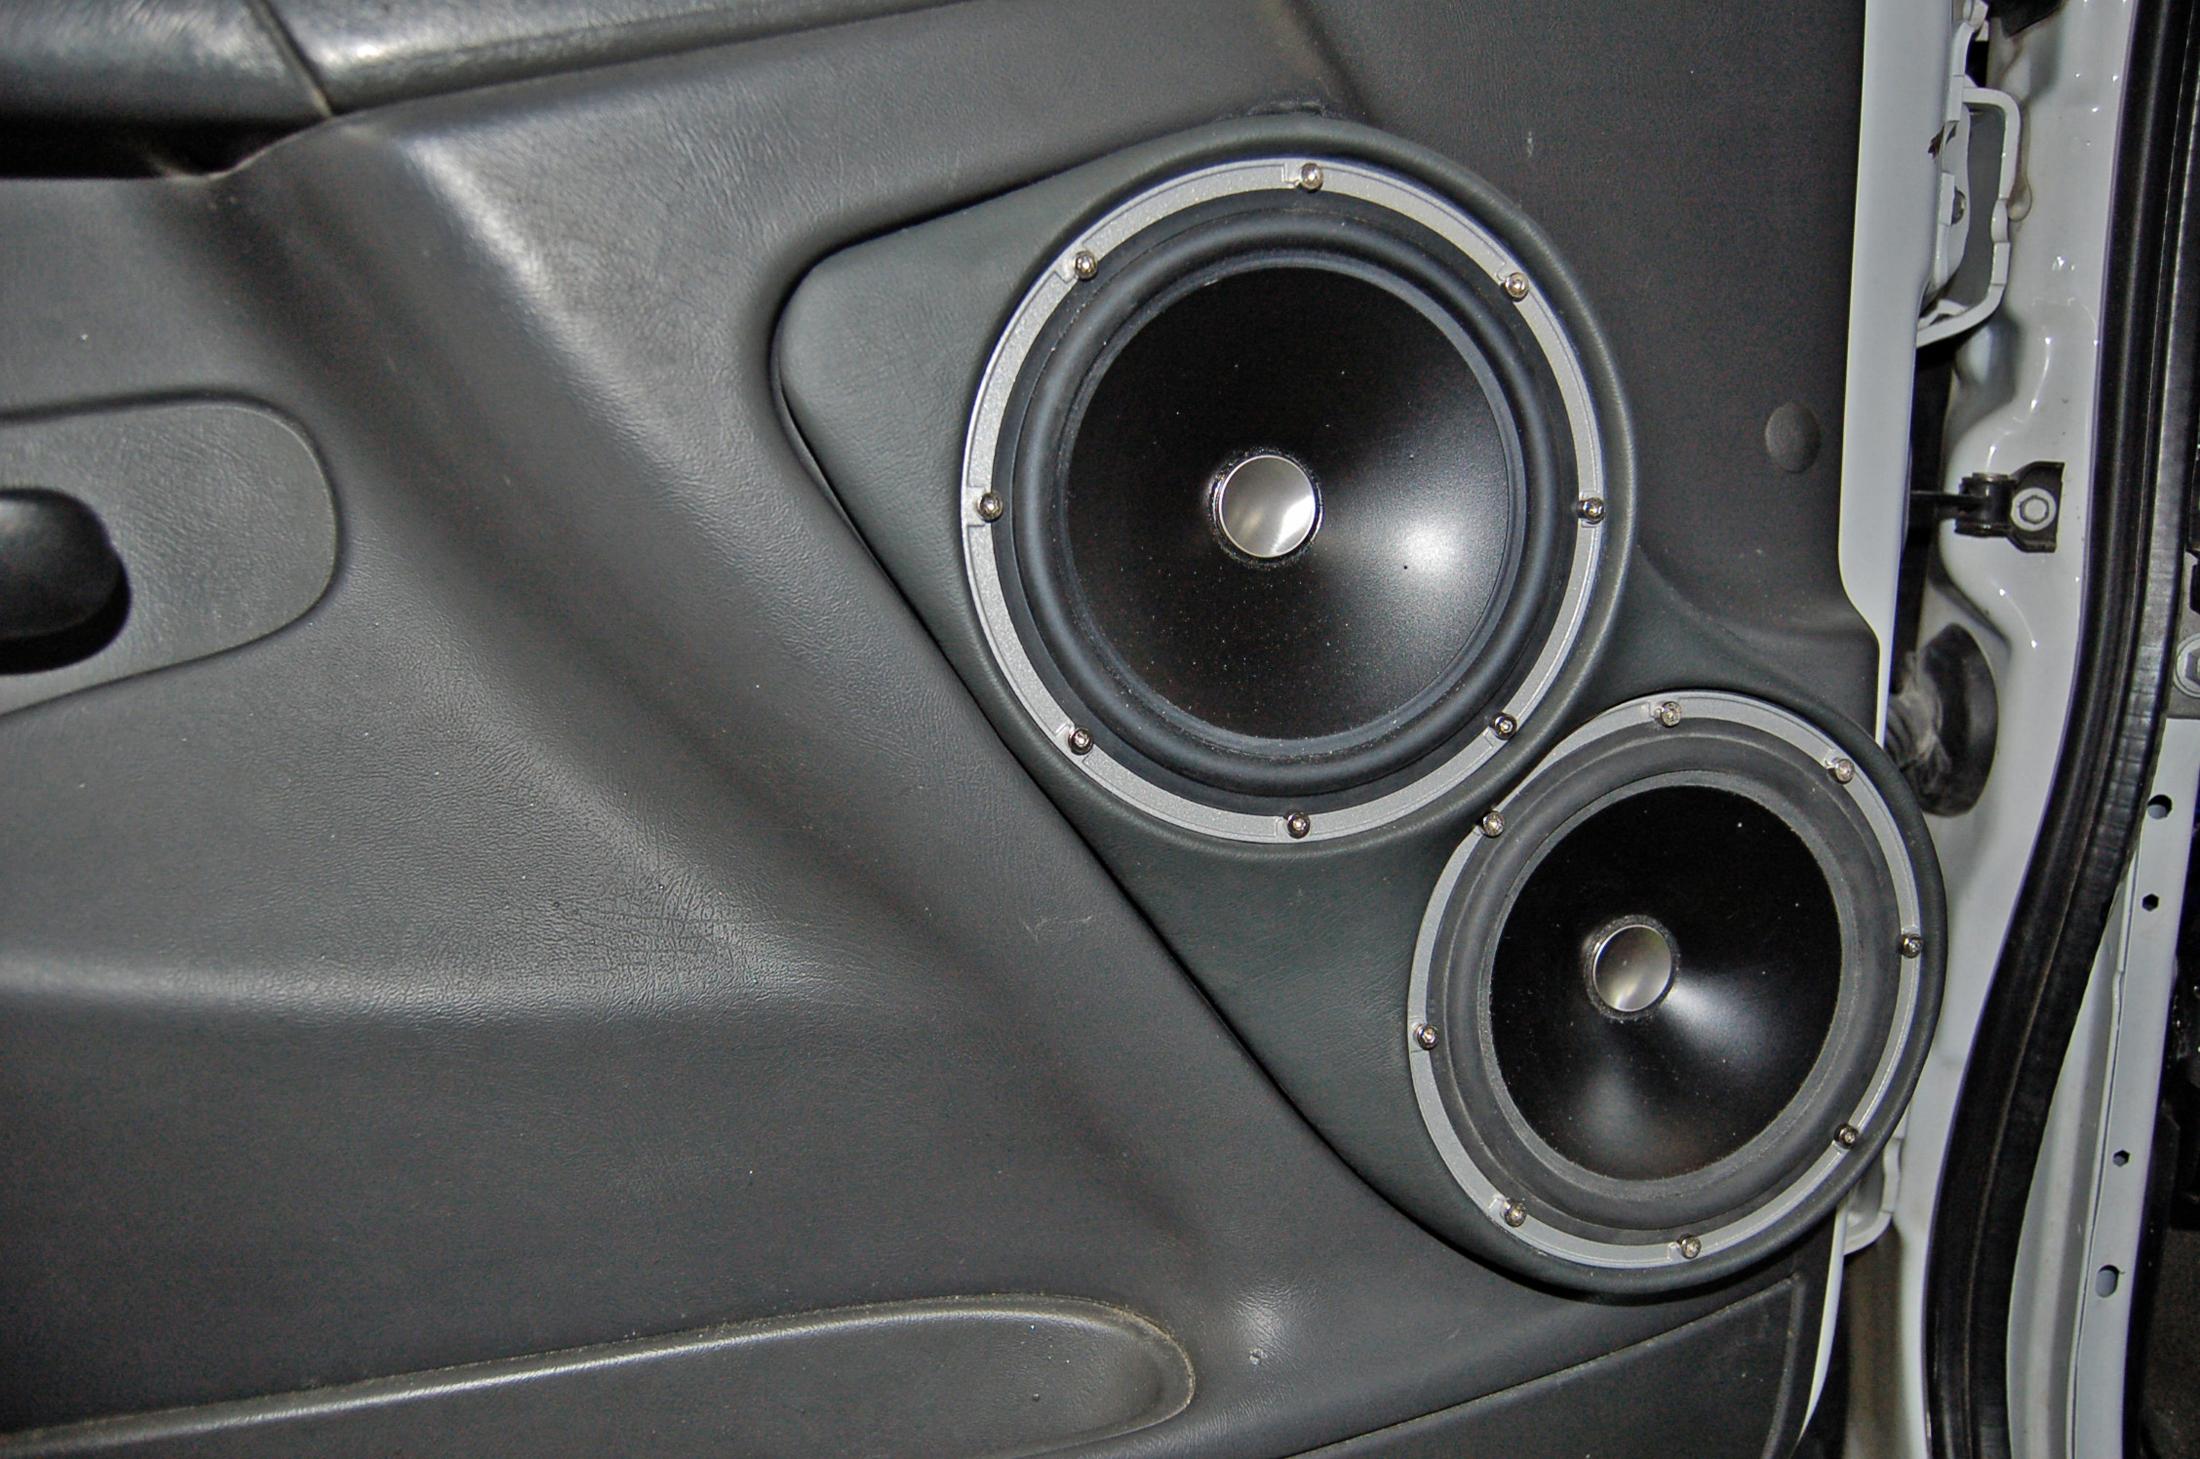 ... two jl audio zr650 speakers in gmc sierra door ... & GMC Sierra 2500HD | Santa Fe Auto Sound pezcame.com